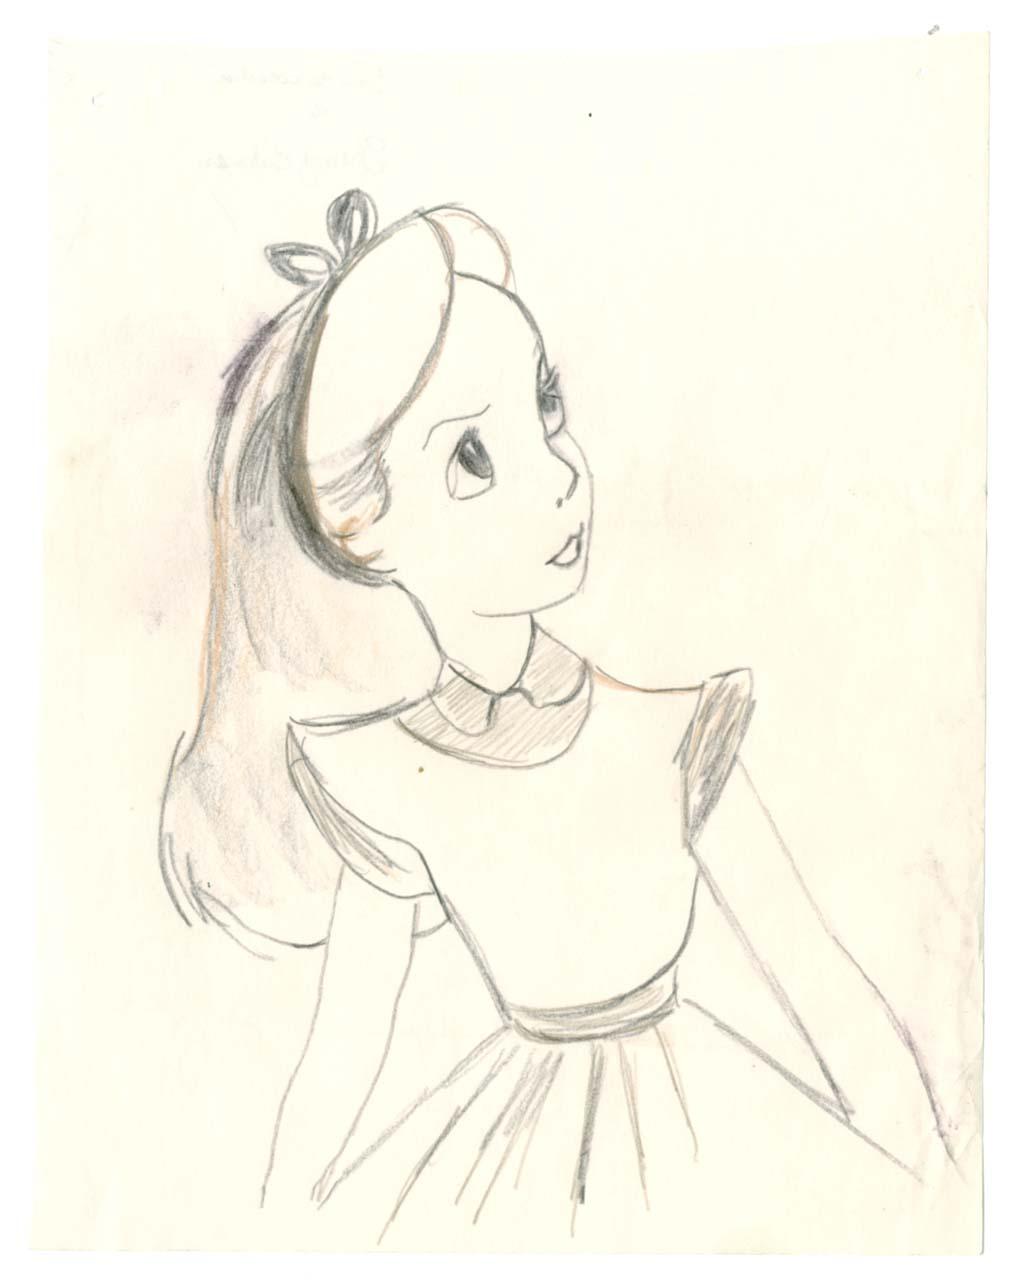 Image shamus culhane alice character sketch blog jpg disney wiki